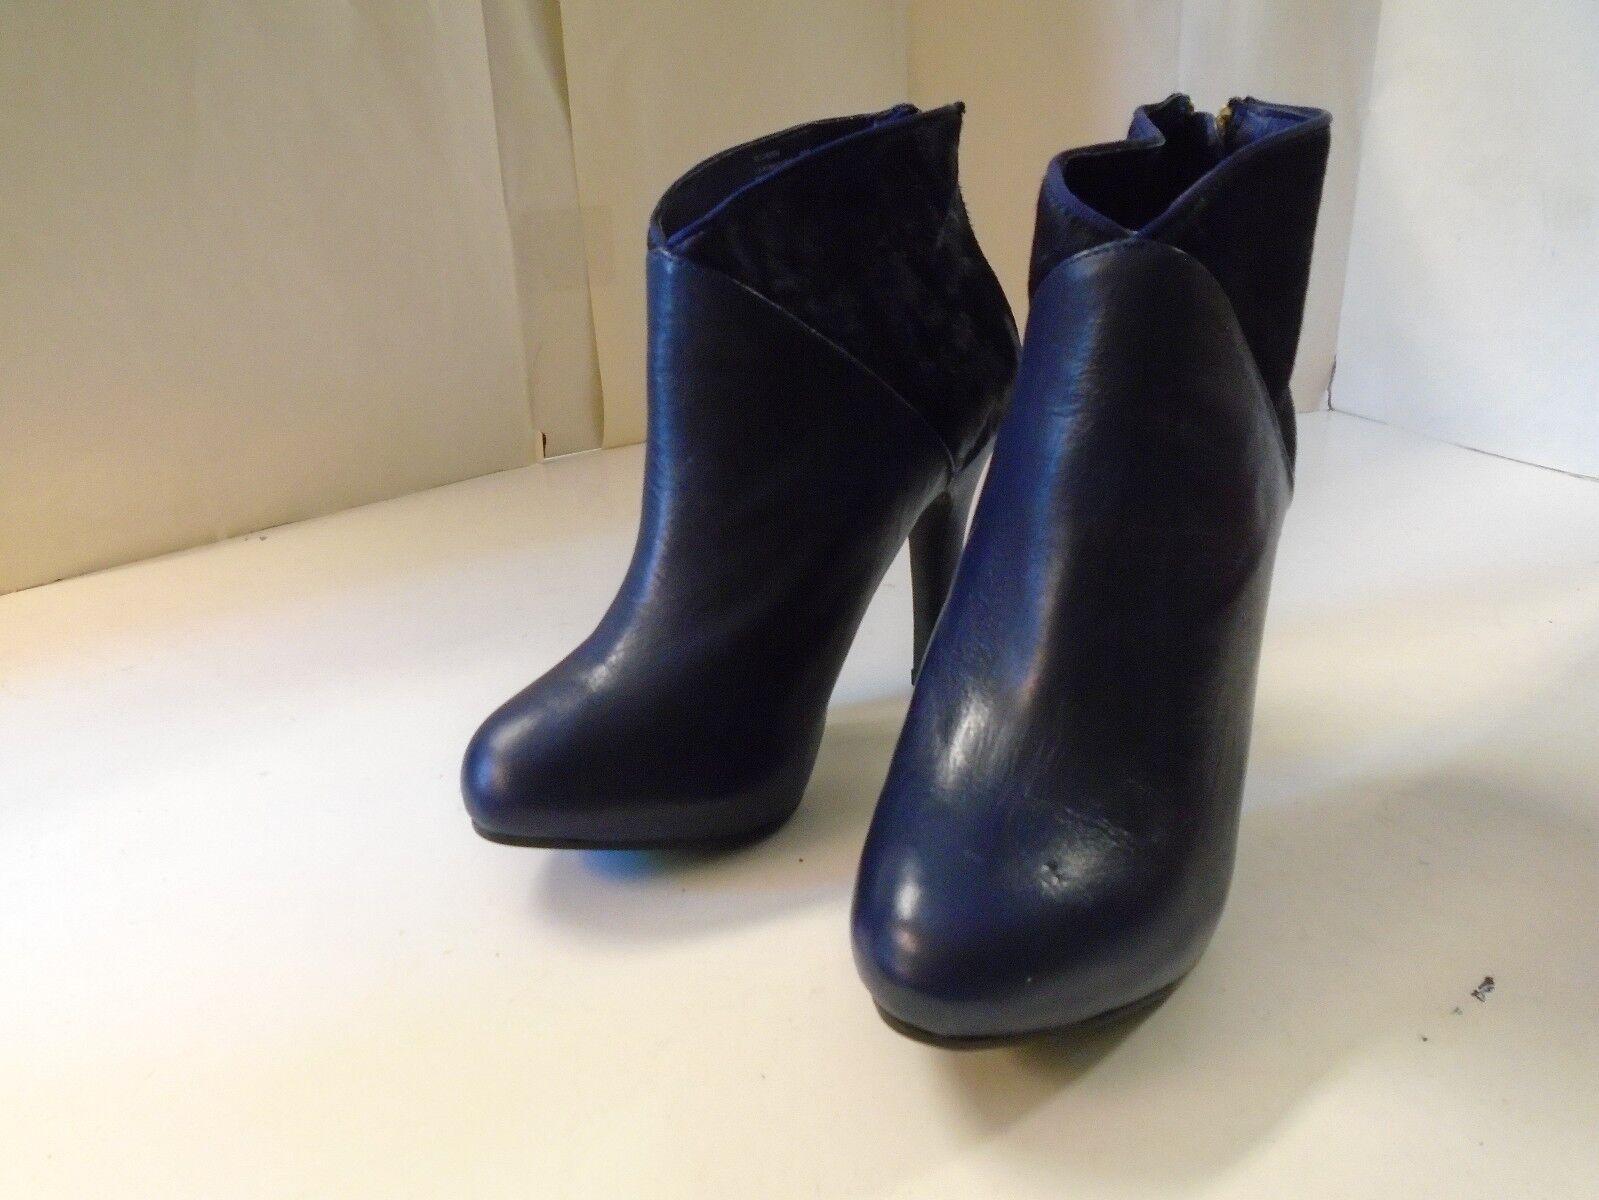 Me Too Lexington Lexington Lexington Ink Blau 6 M Leather Fashion Ankle Heel Real Fur Upper New 8ad25f